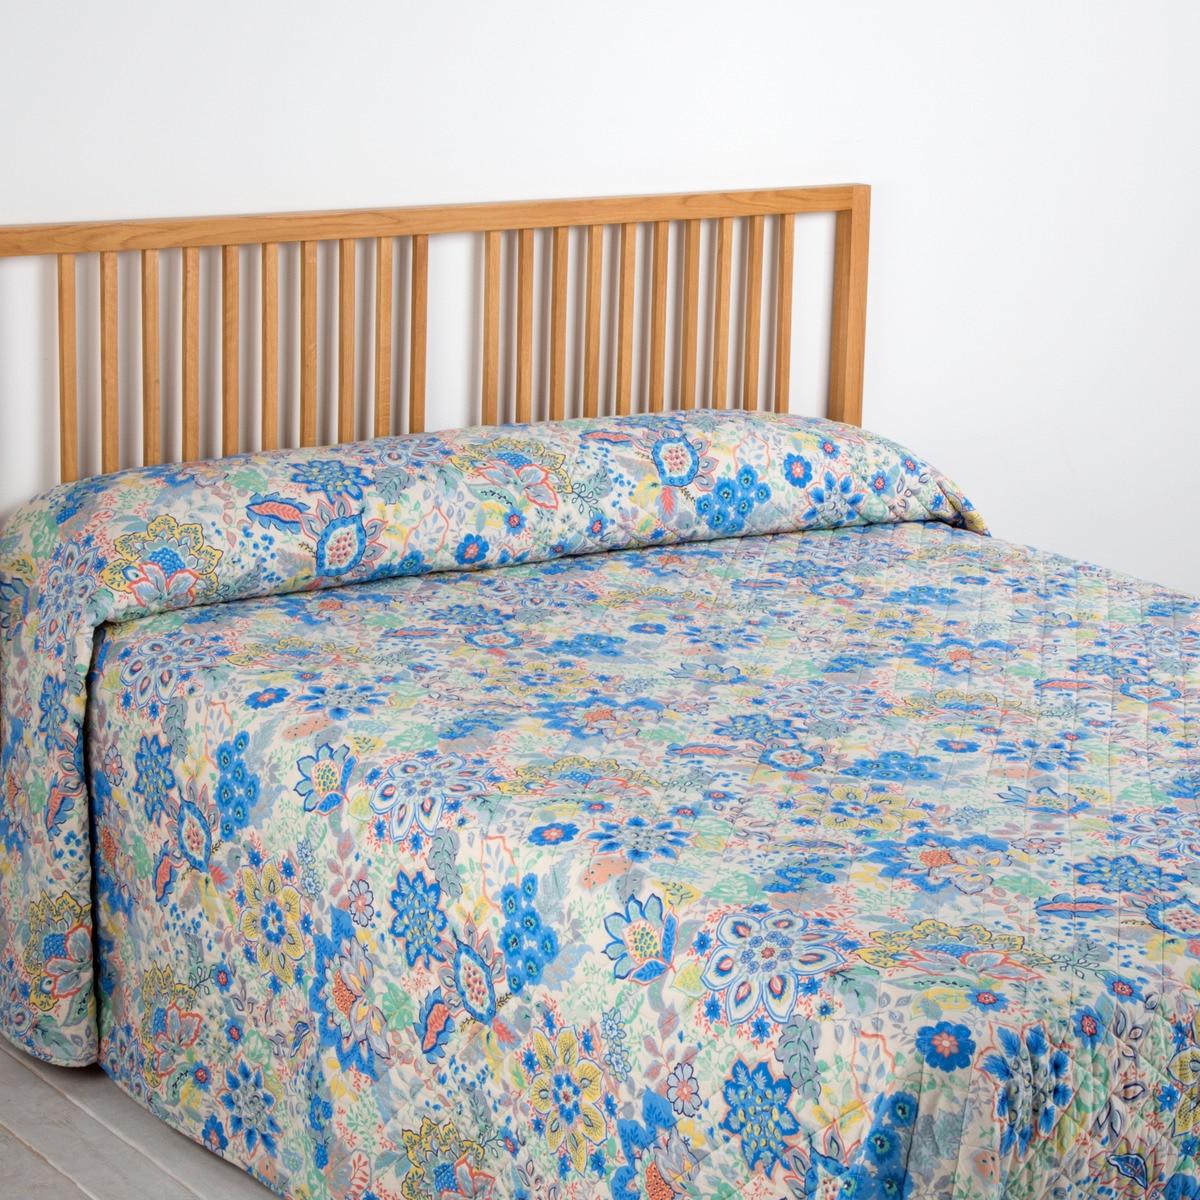 El-Corte-Ingles-Millau-blue-eiderdown